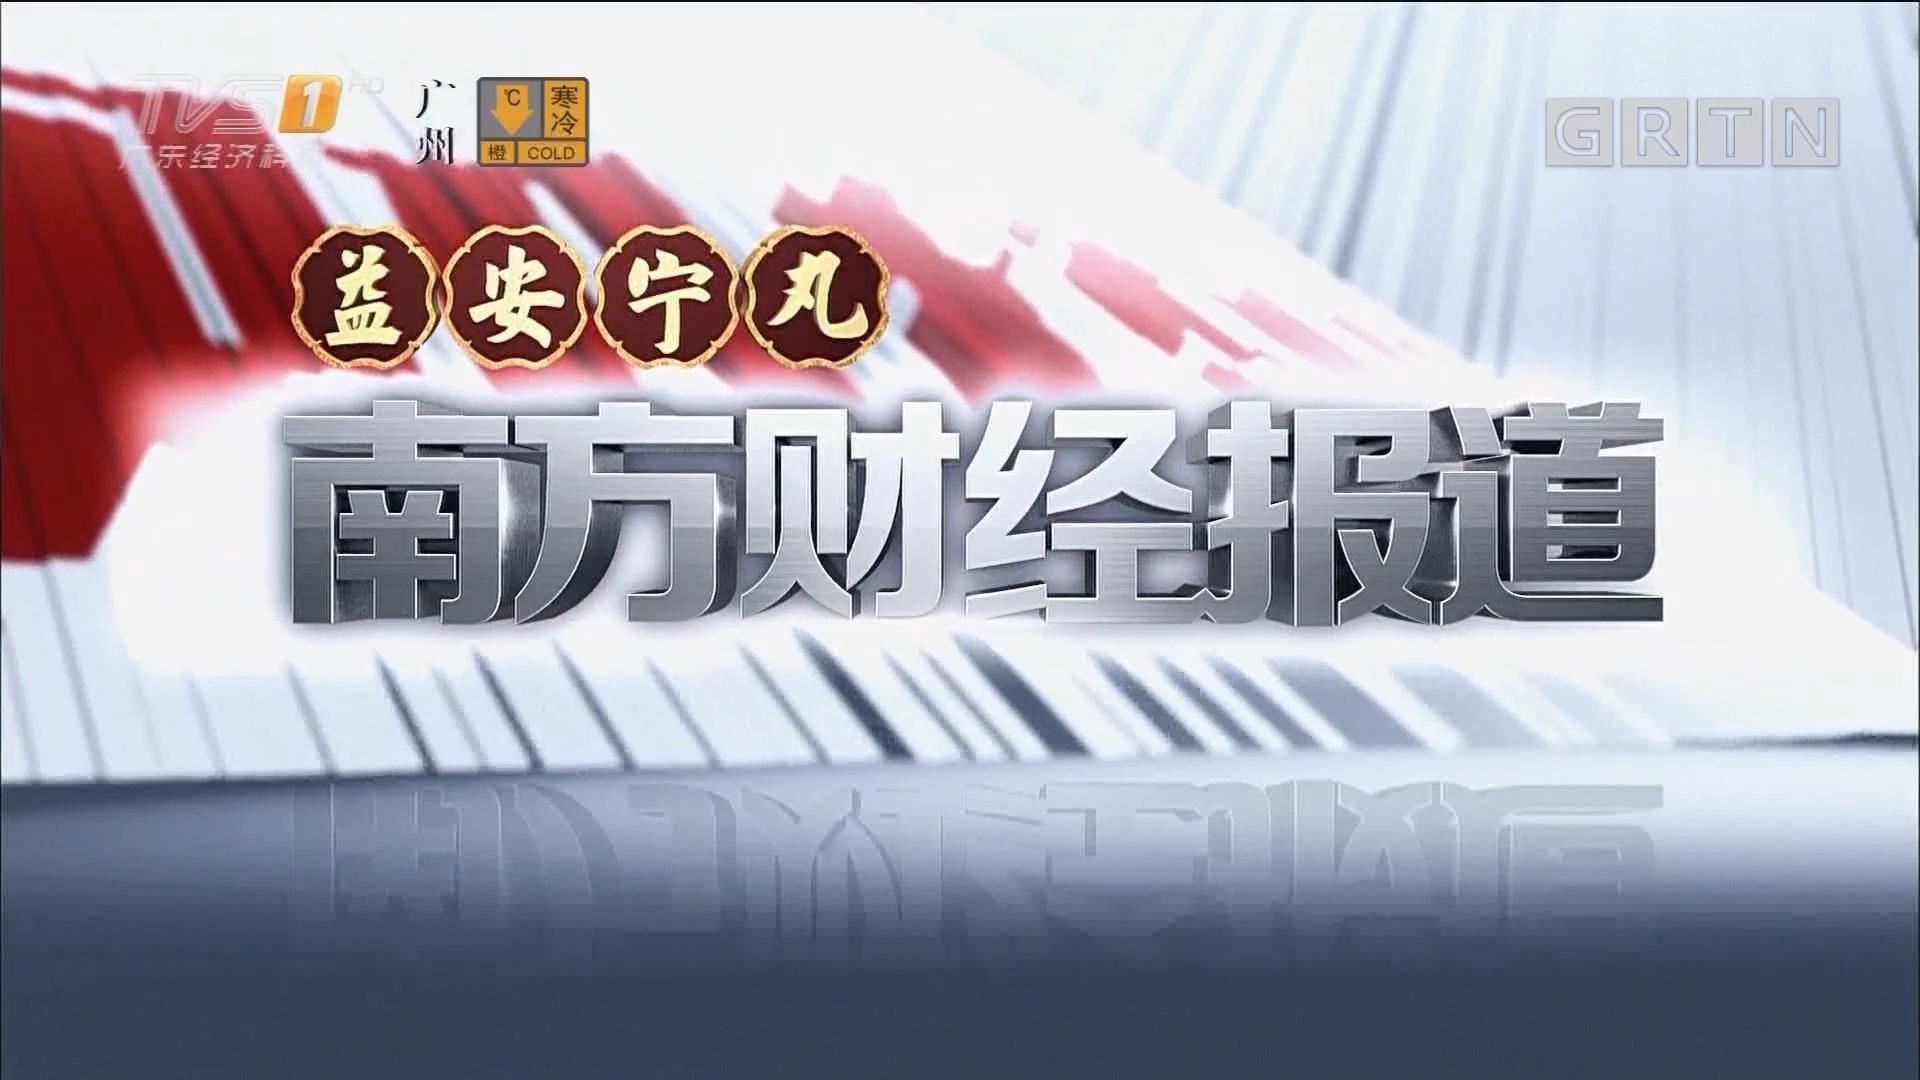 [HD][2018-12-29]南方财经报道:为粤商加油!广东工商联成立65周年座谈会召开